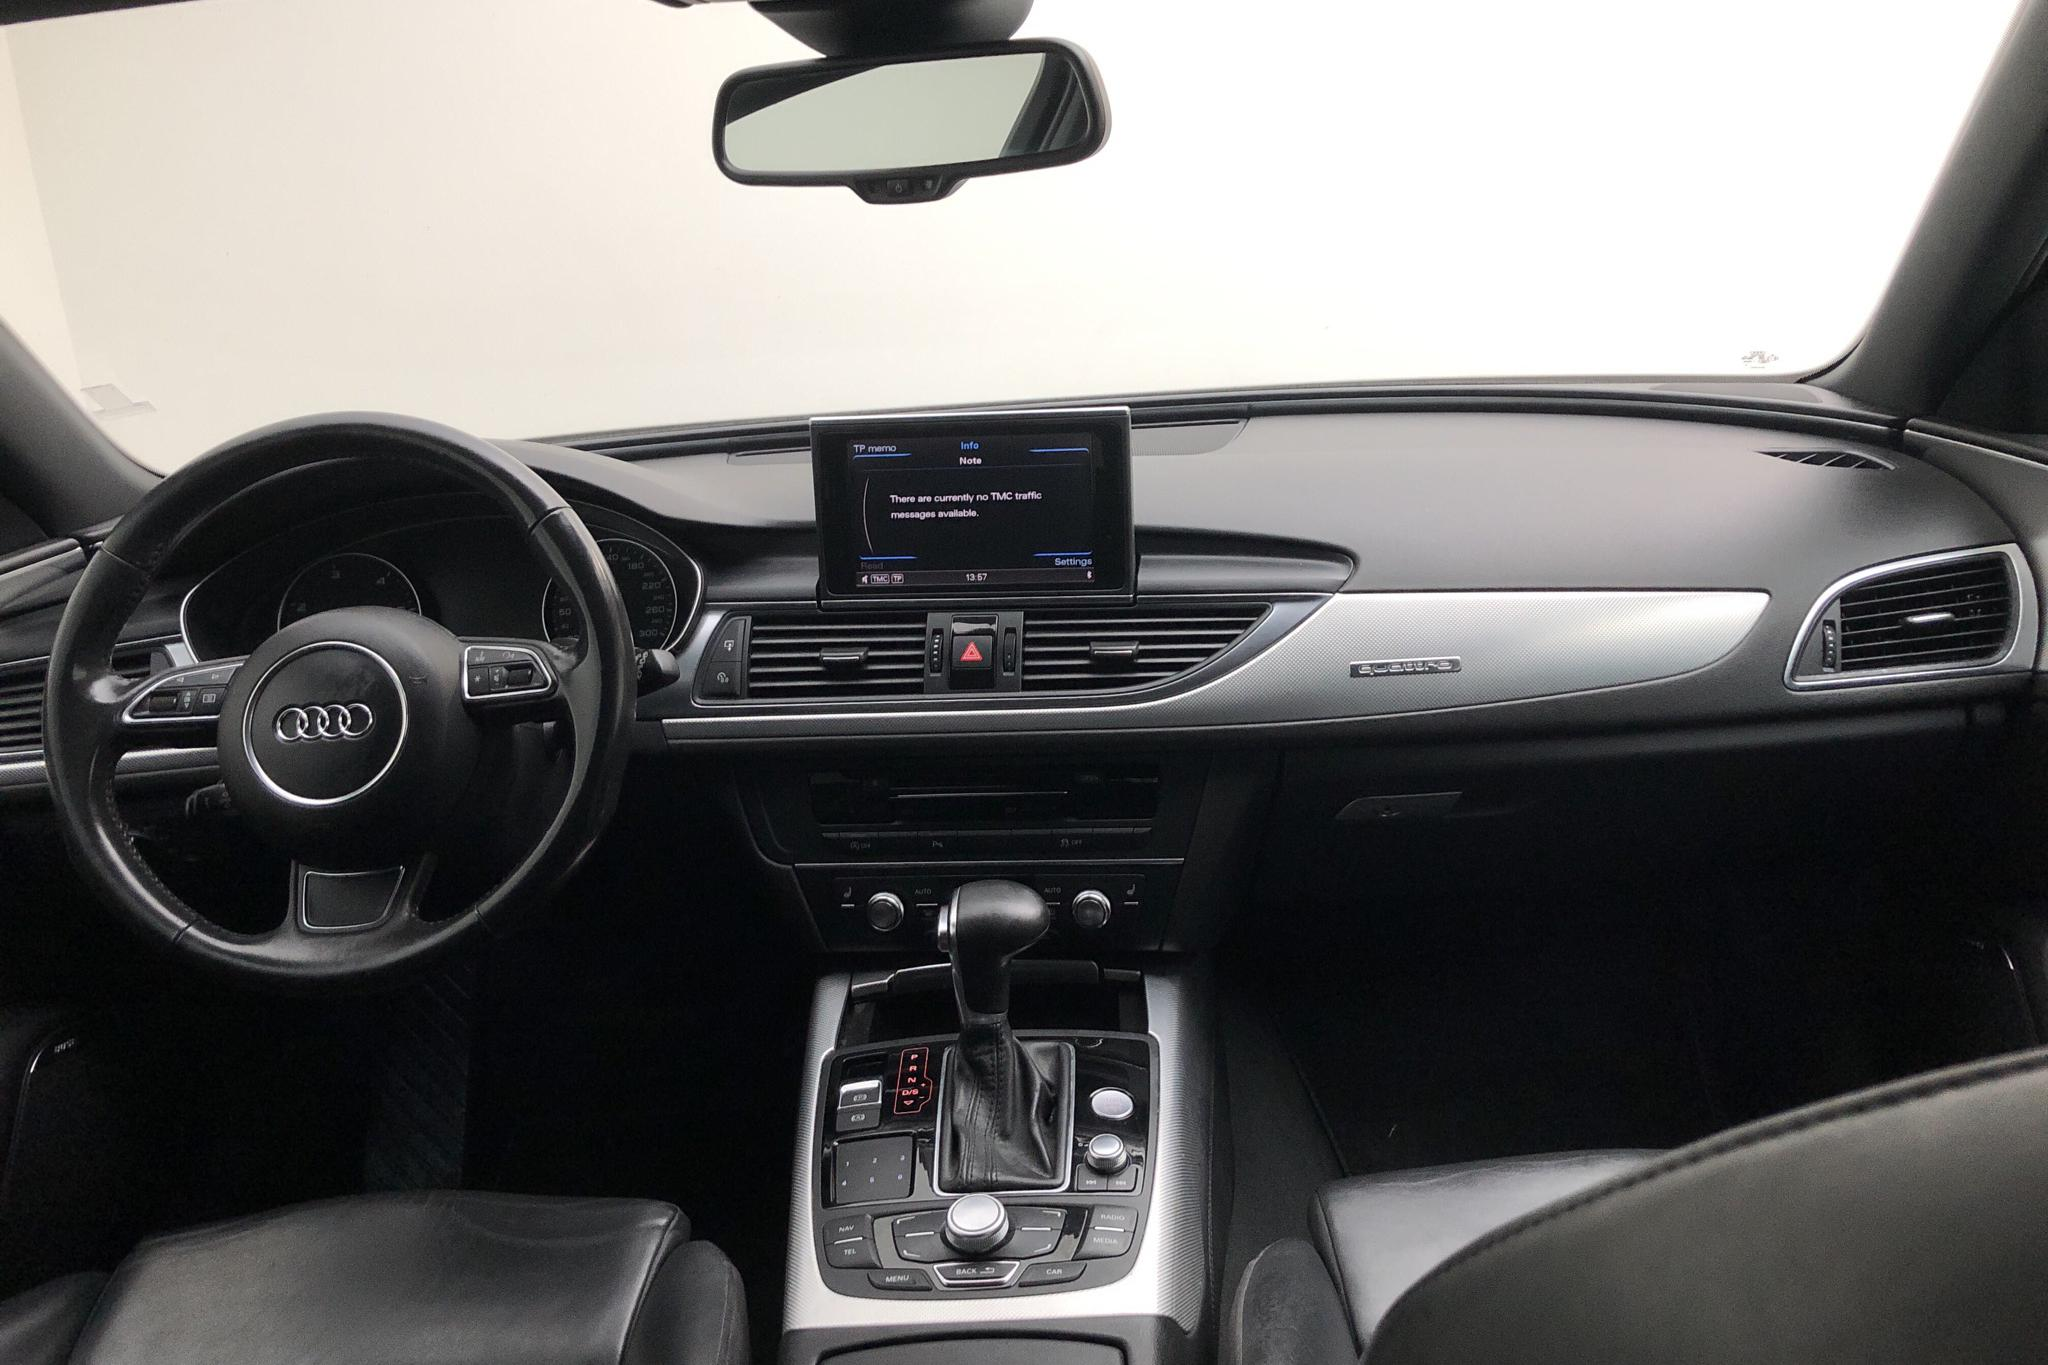 Audi A6 3.0 TDI Avant quattro (245hk) - 202 570 km - Automatic - white - 2012